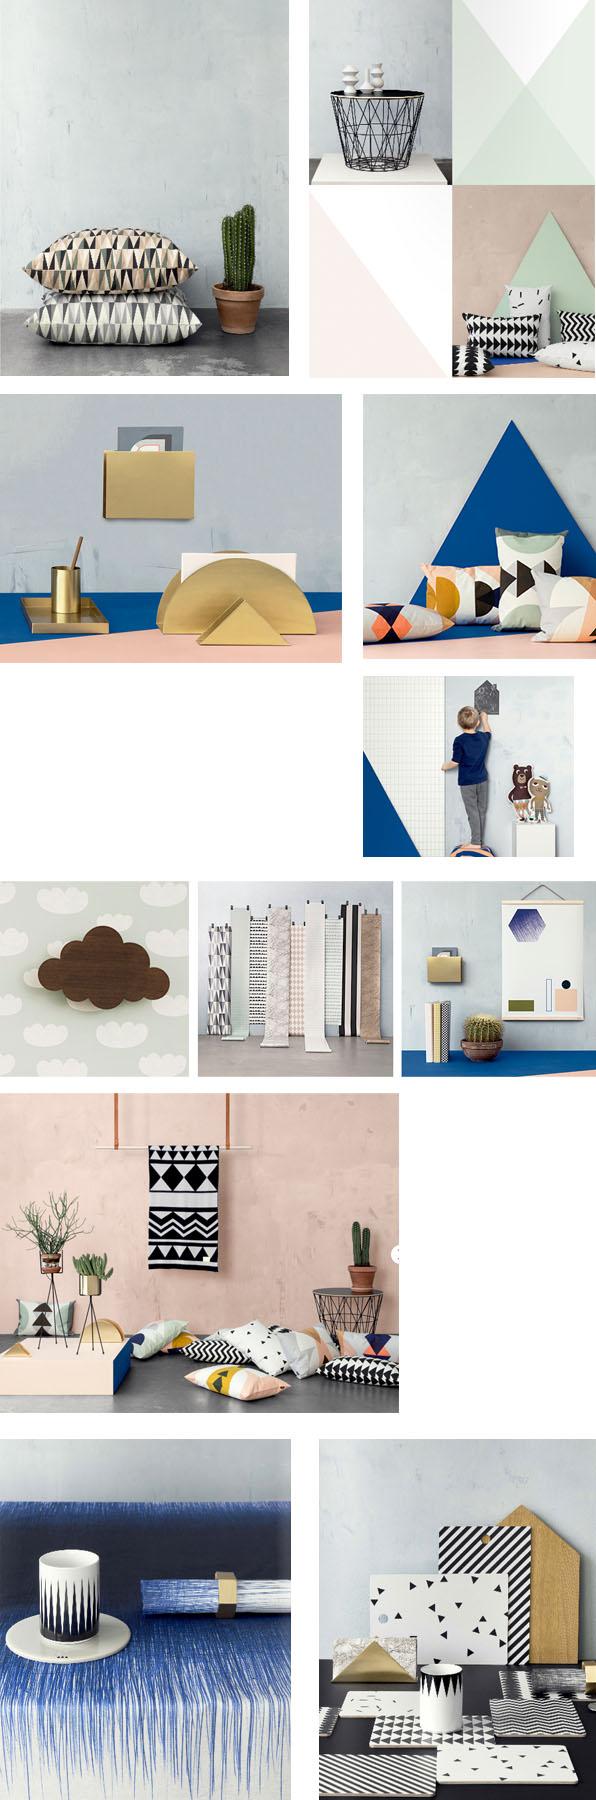 diseño nórdico nordic design de ferm LIVING en modus-vivendi prefab arquitectura arquitectos modusvivendi